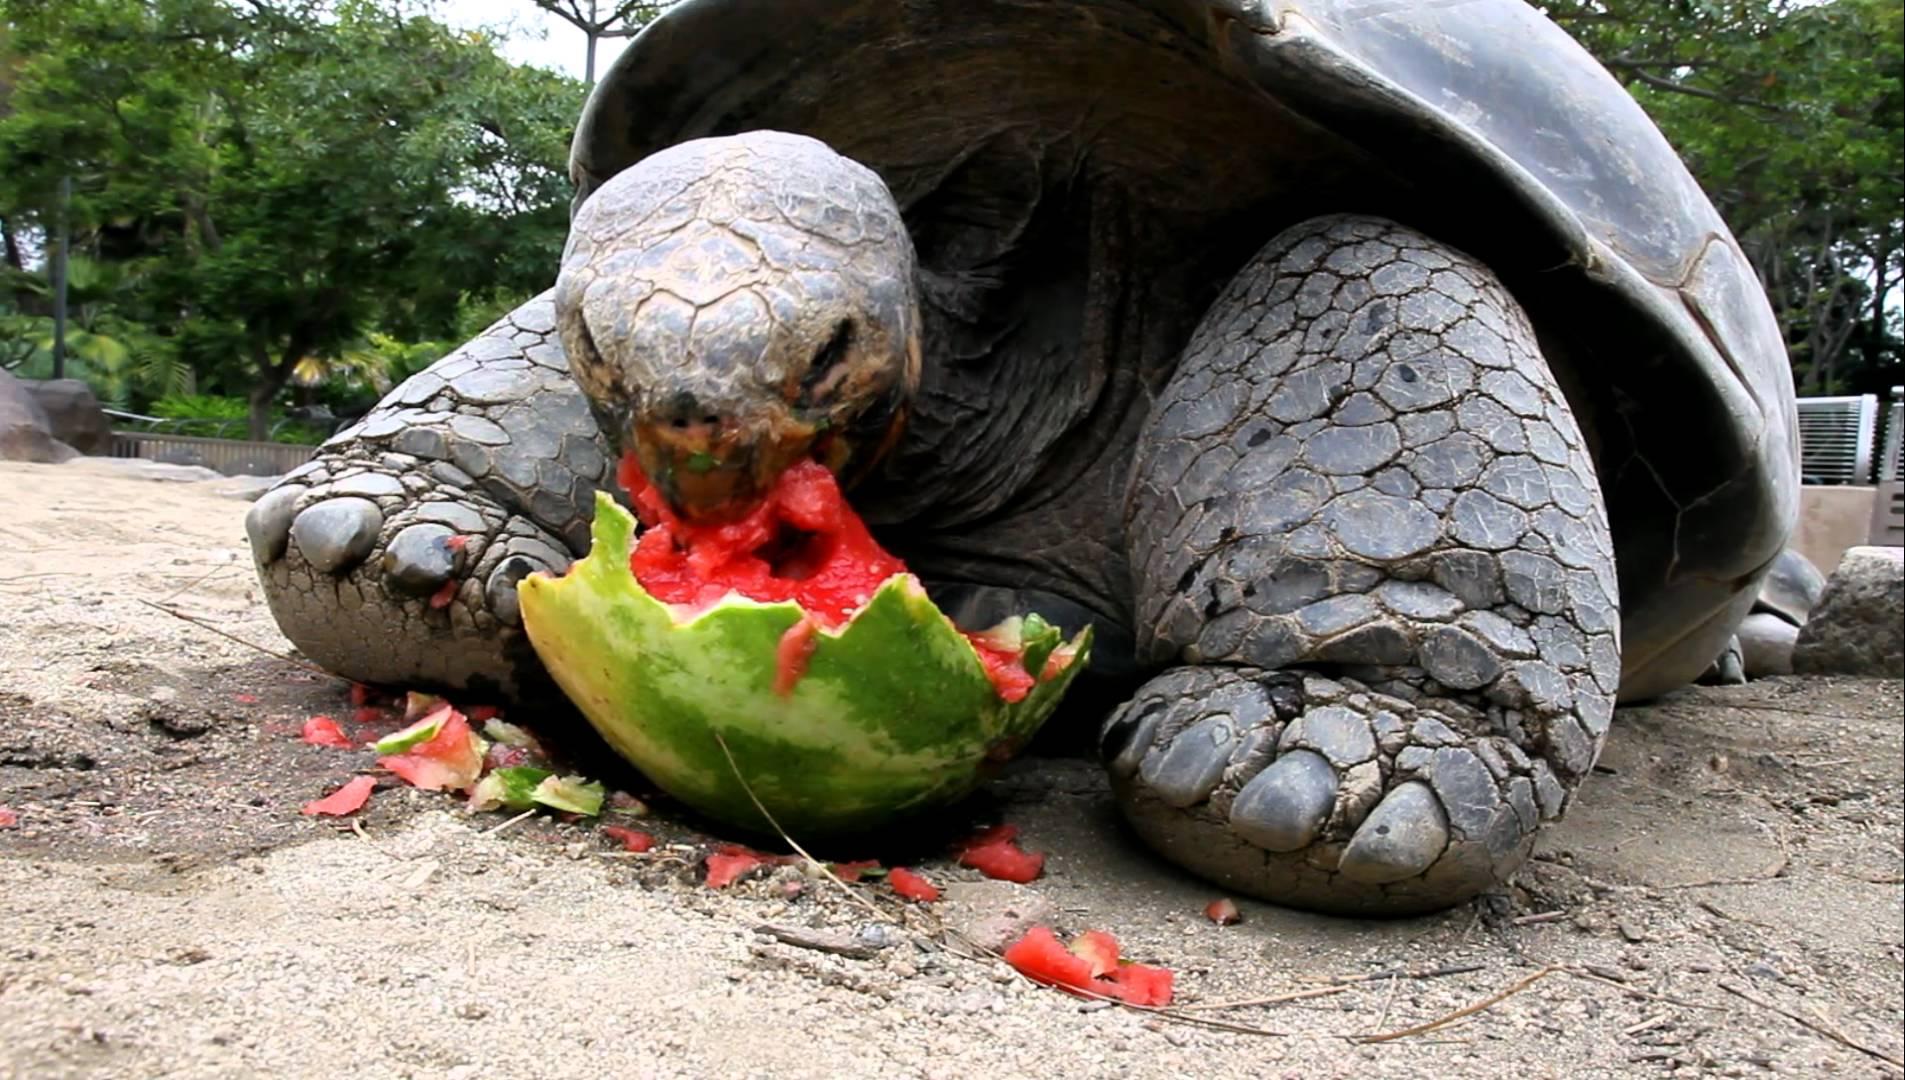 Can Turtles Eat Dog Food